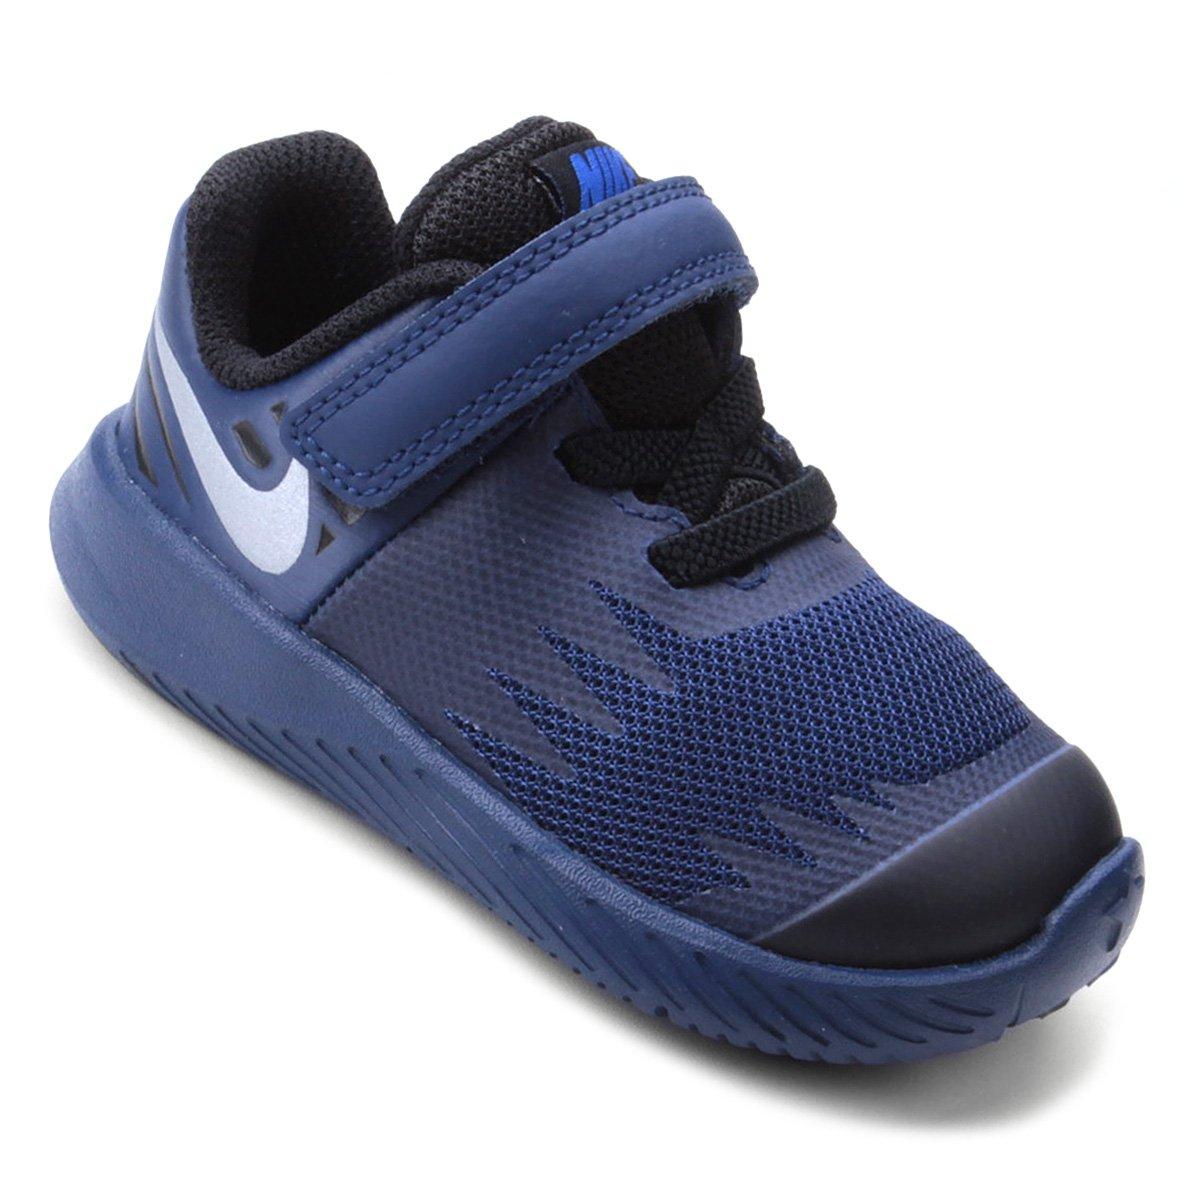 17356c2a1ea Tênis Infantil Couro Nike Star Runner Reflective Masculino - Marinho ...